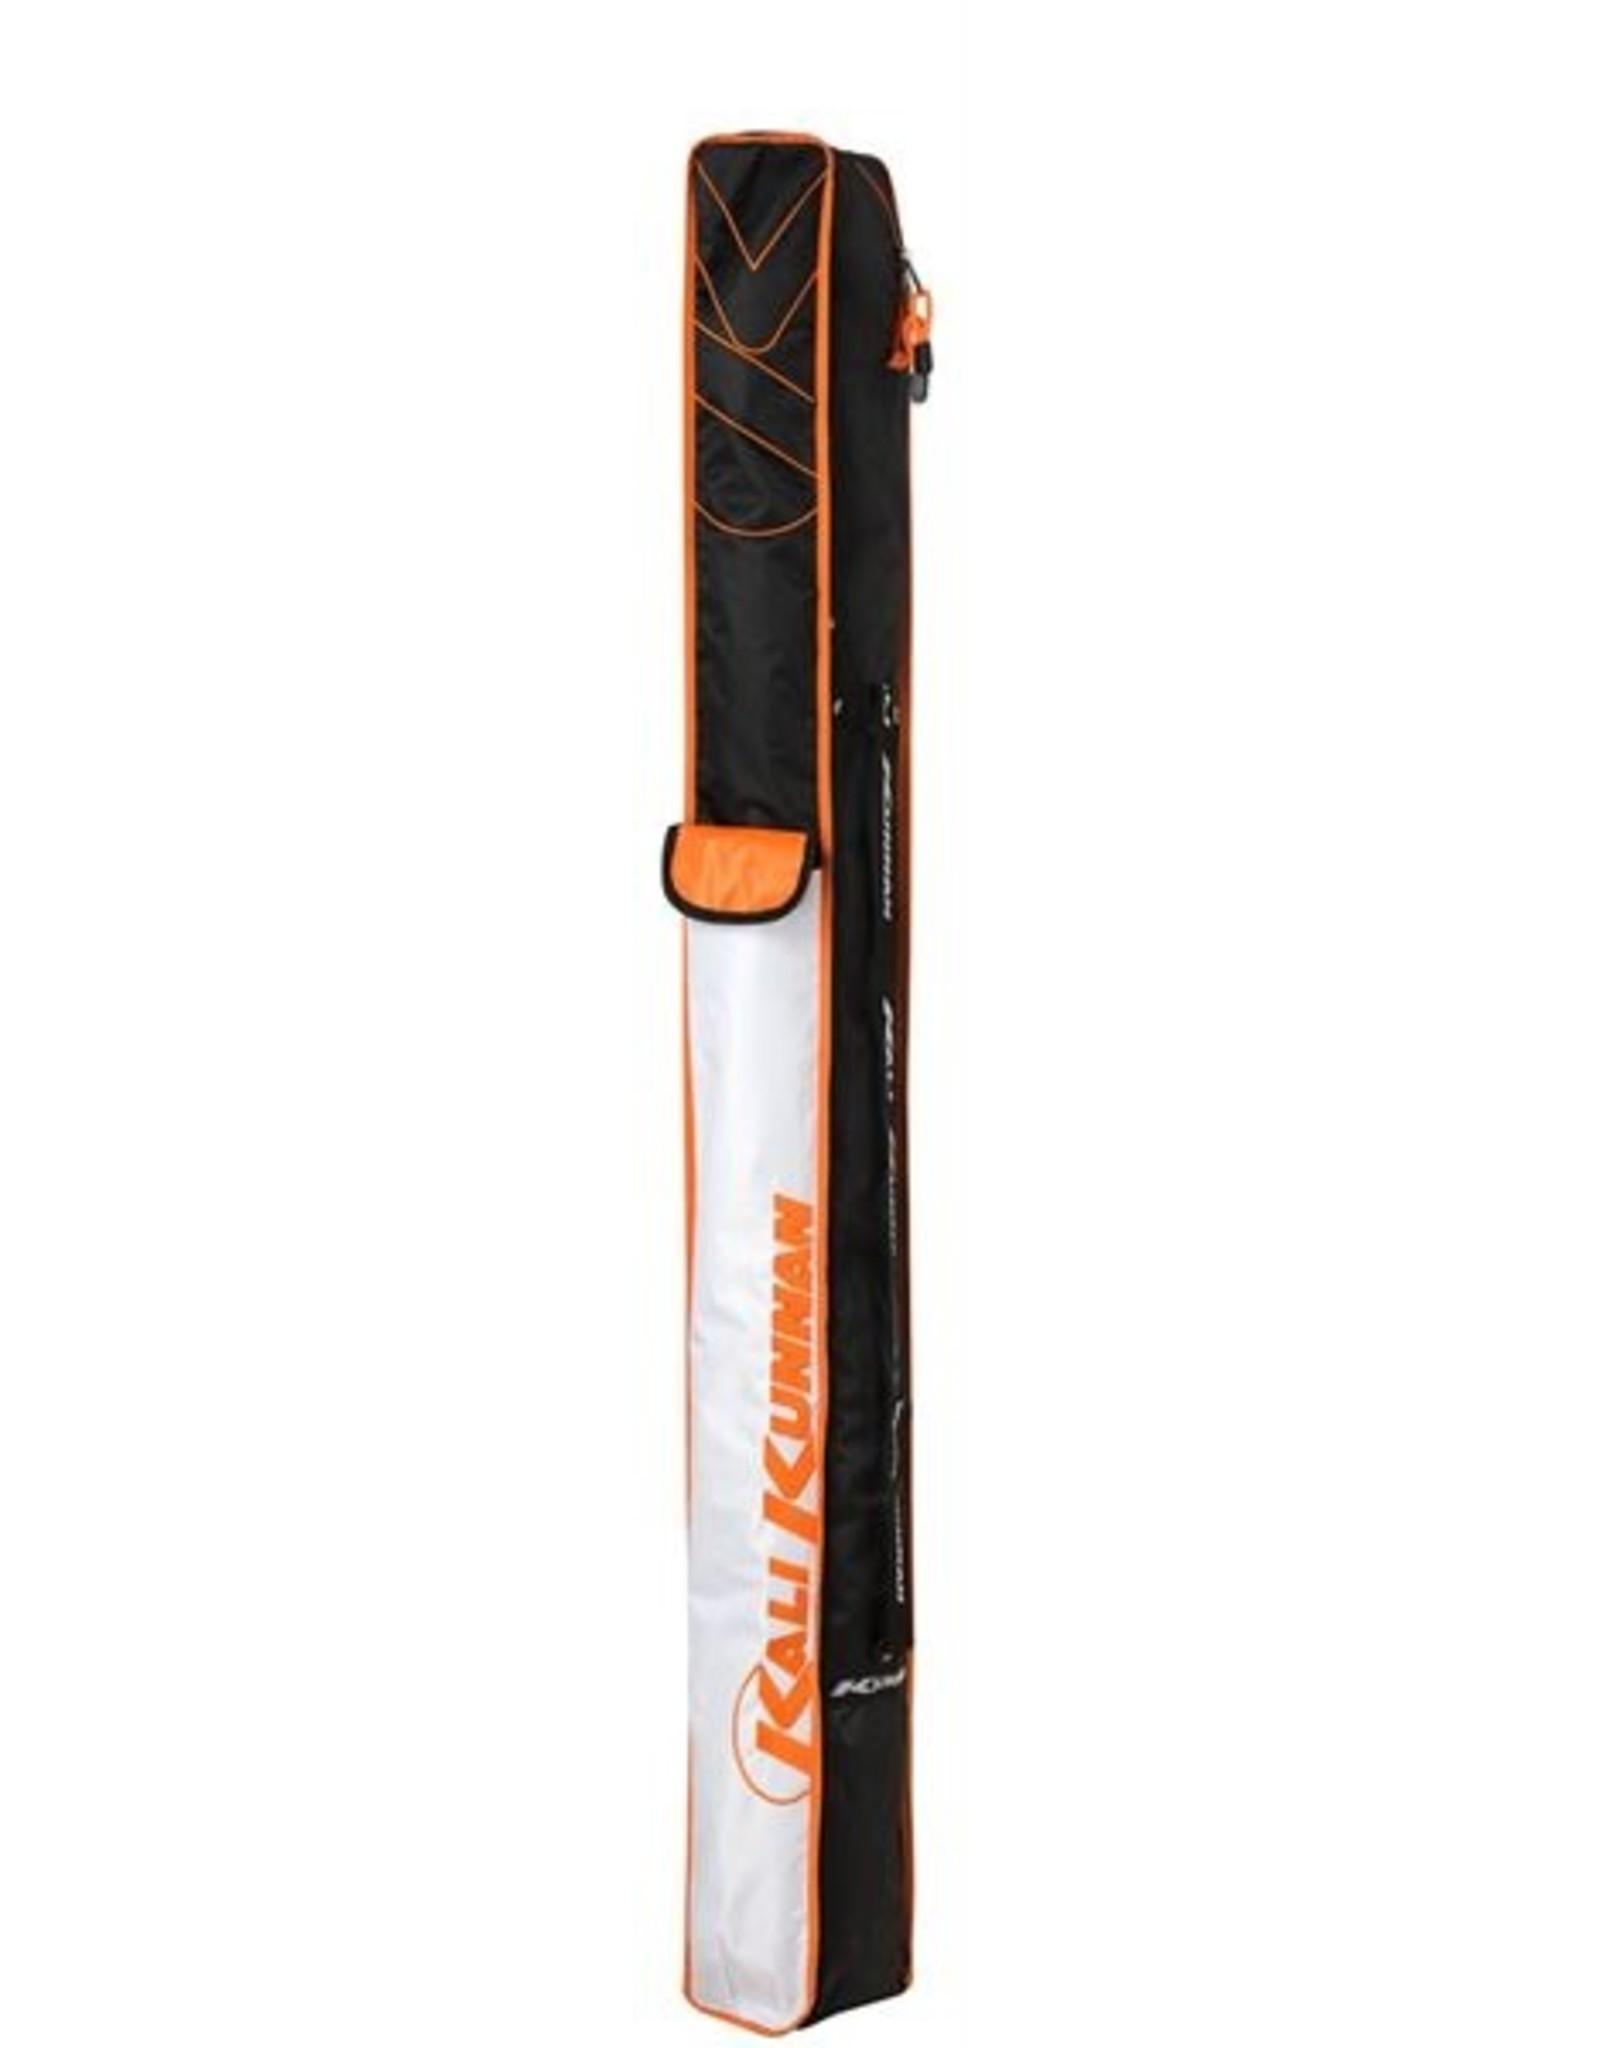 Kali Kunnan Kali Kunnan 5165 Rod Case 165cm